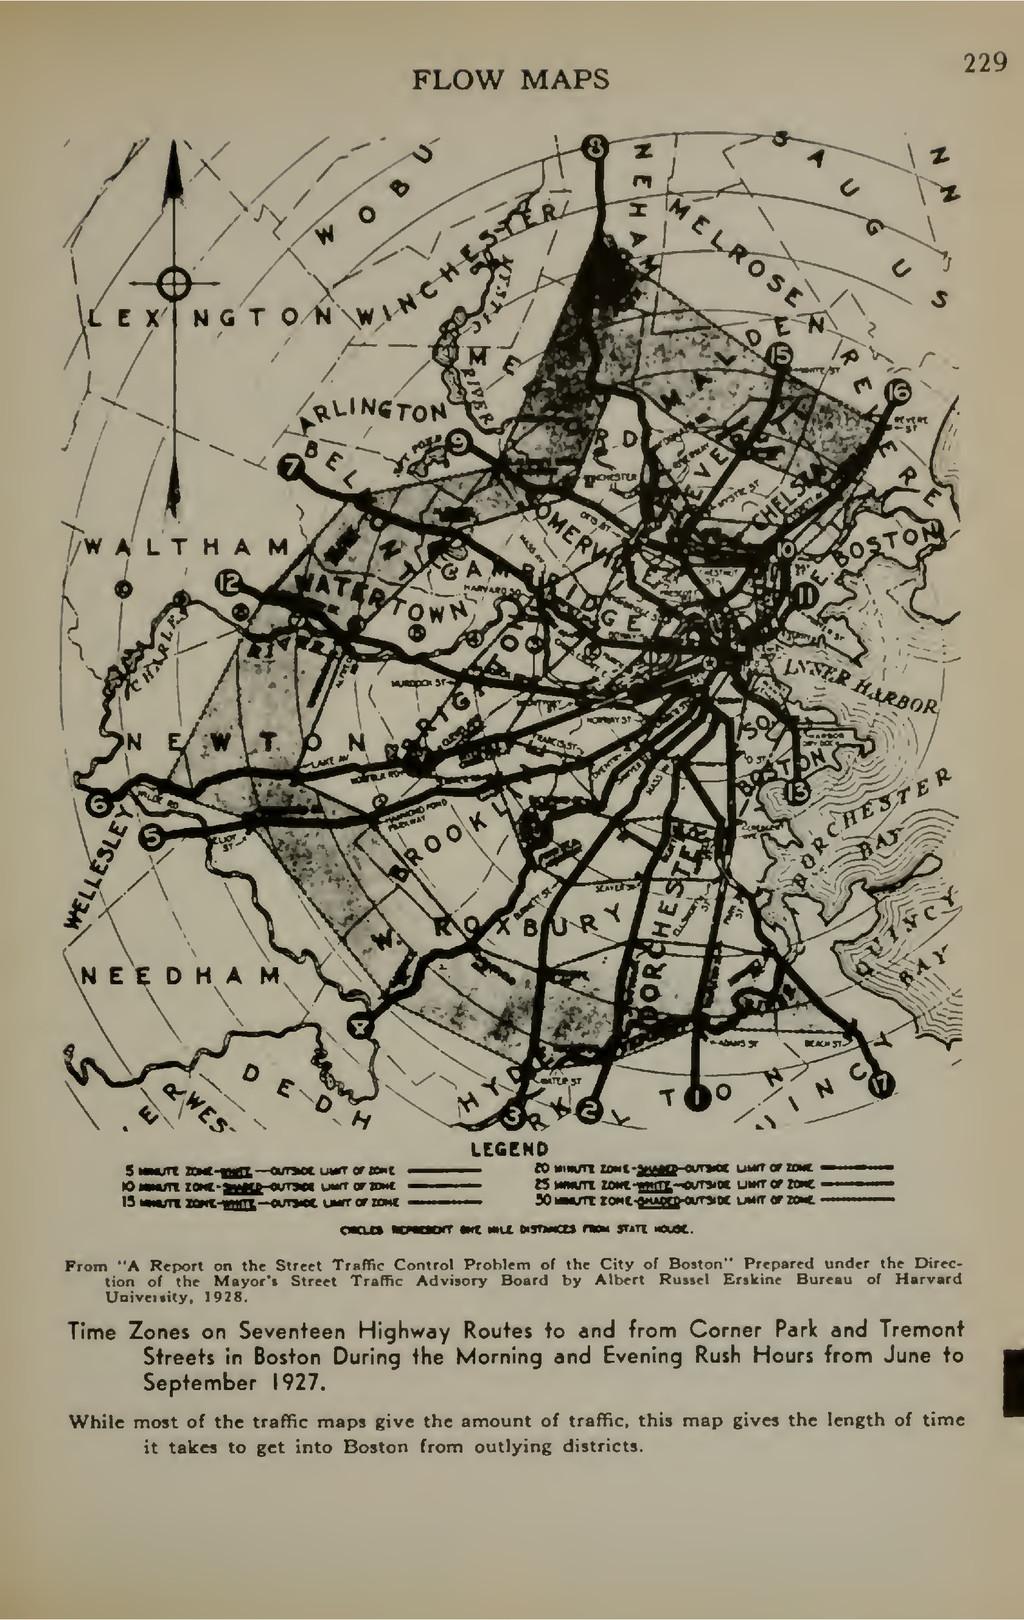 FLOW MAPS 229 IS UMITOrttMC uMTT ormc LEGEND — ...